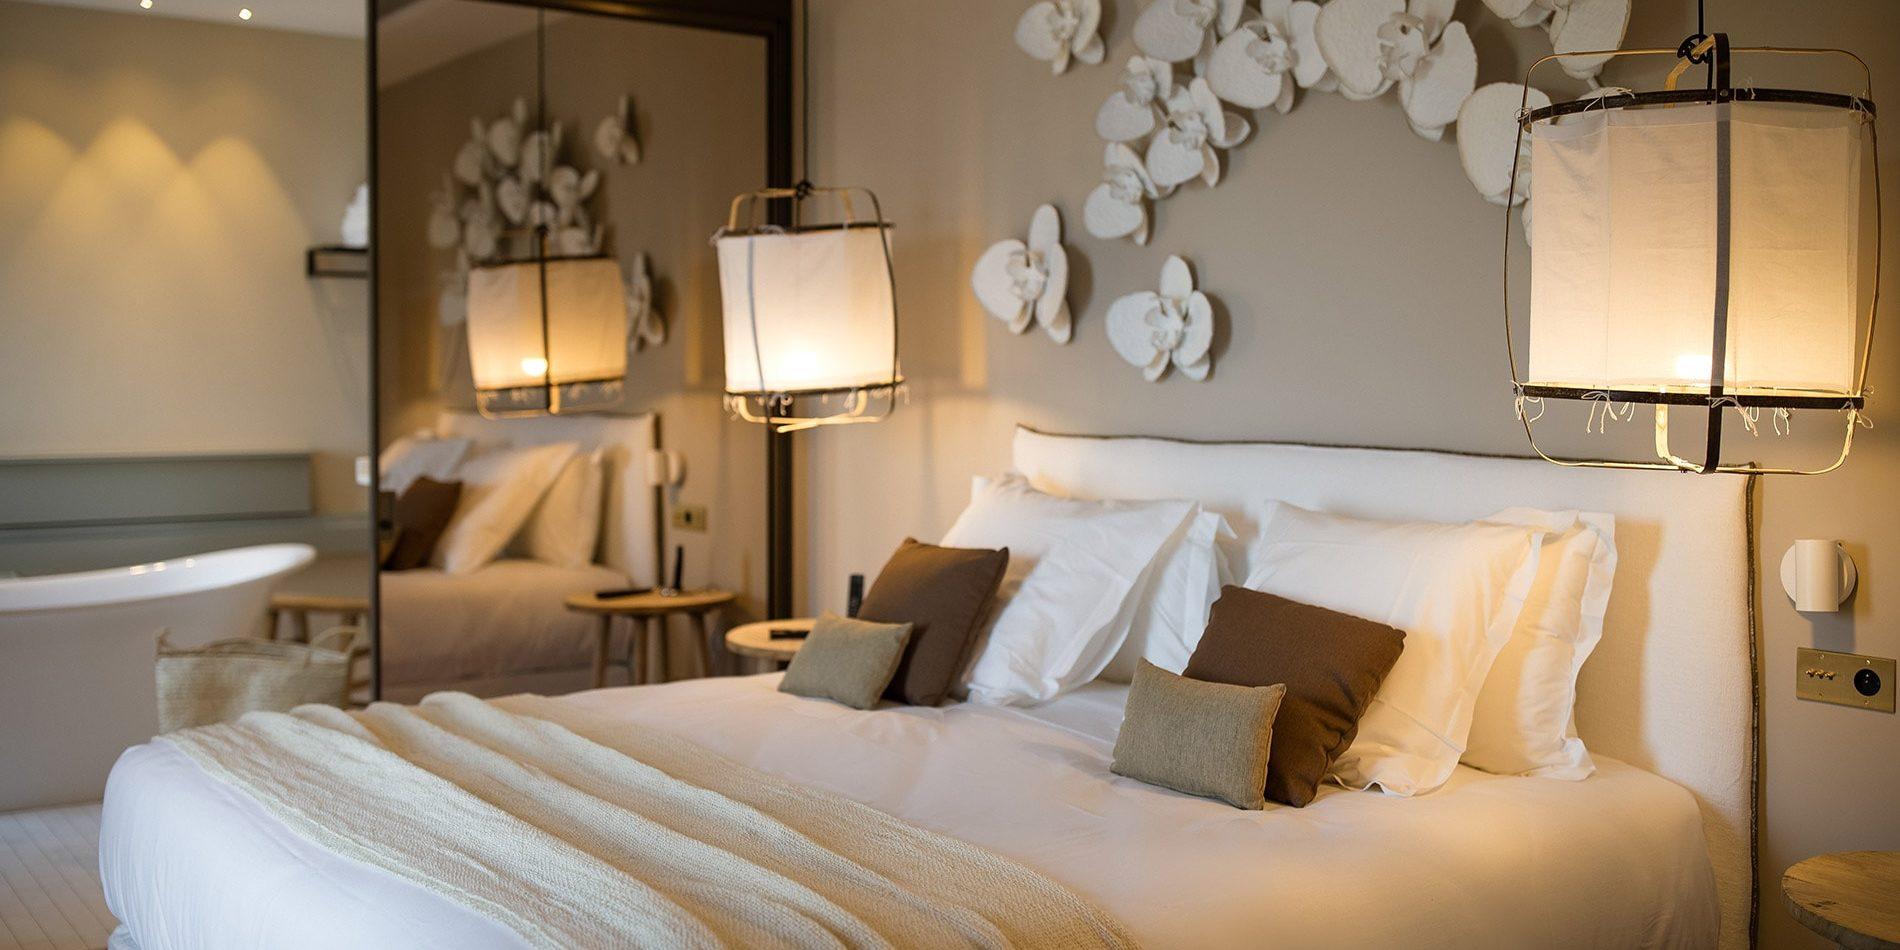 Hotel Misincu Cagnano Cap Corse Corsica Frankrijk kamer bad kamer en suite